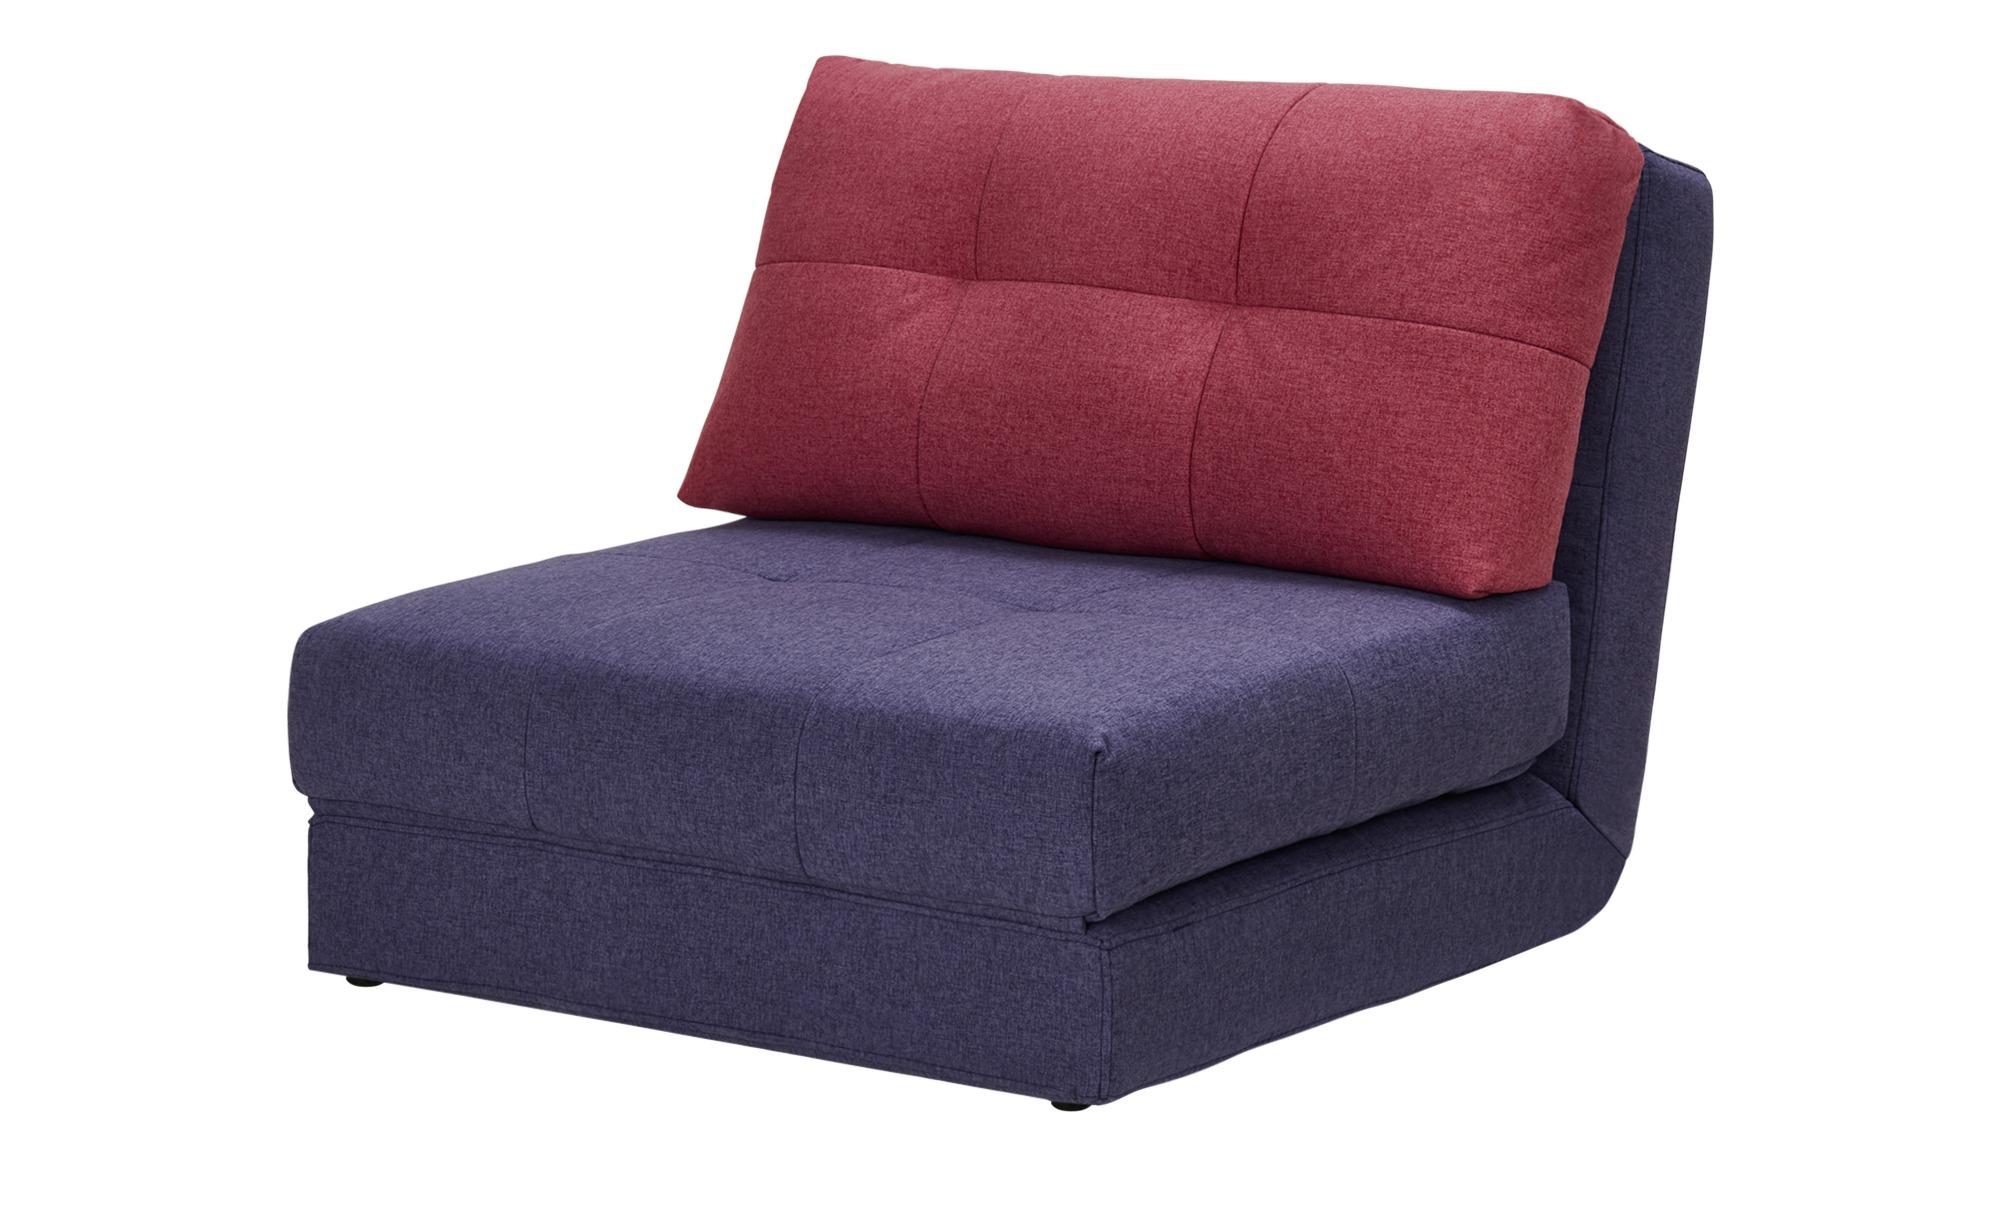 Schlafsessel - lila/violett - 90 cm - 72 cm - 80 cm - Polstermöbel > Sessel > Polstersessel - Möbel Kraft | Schlafzimmer > Schlafsofas > Schlafsessel | Sconto